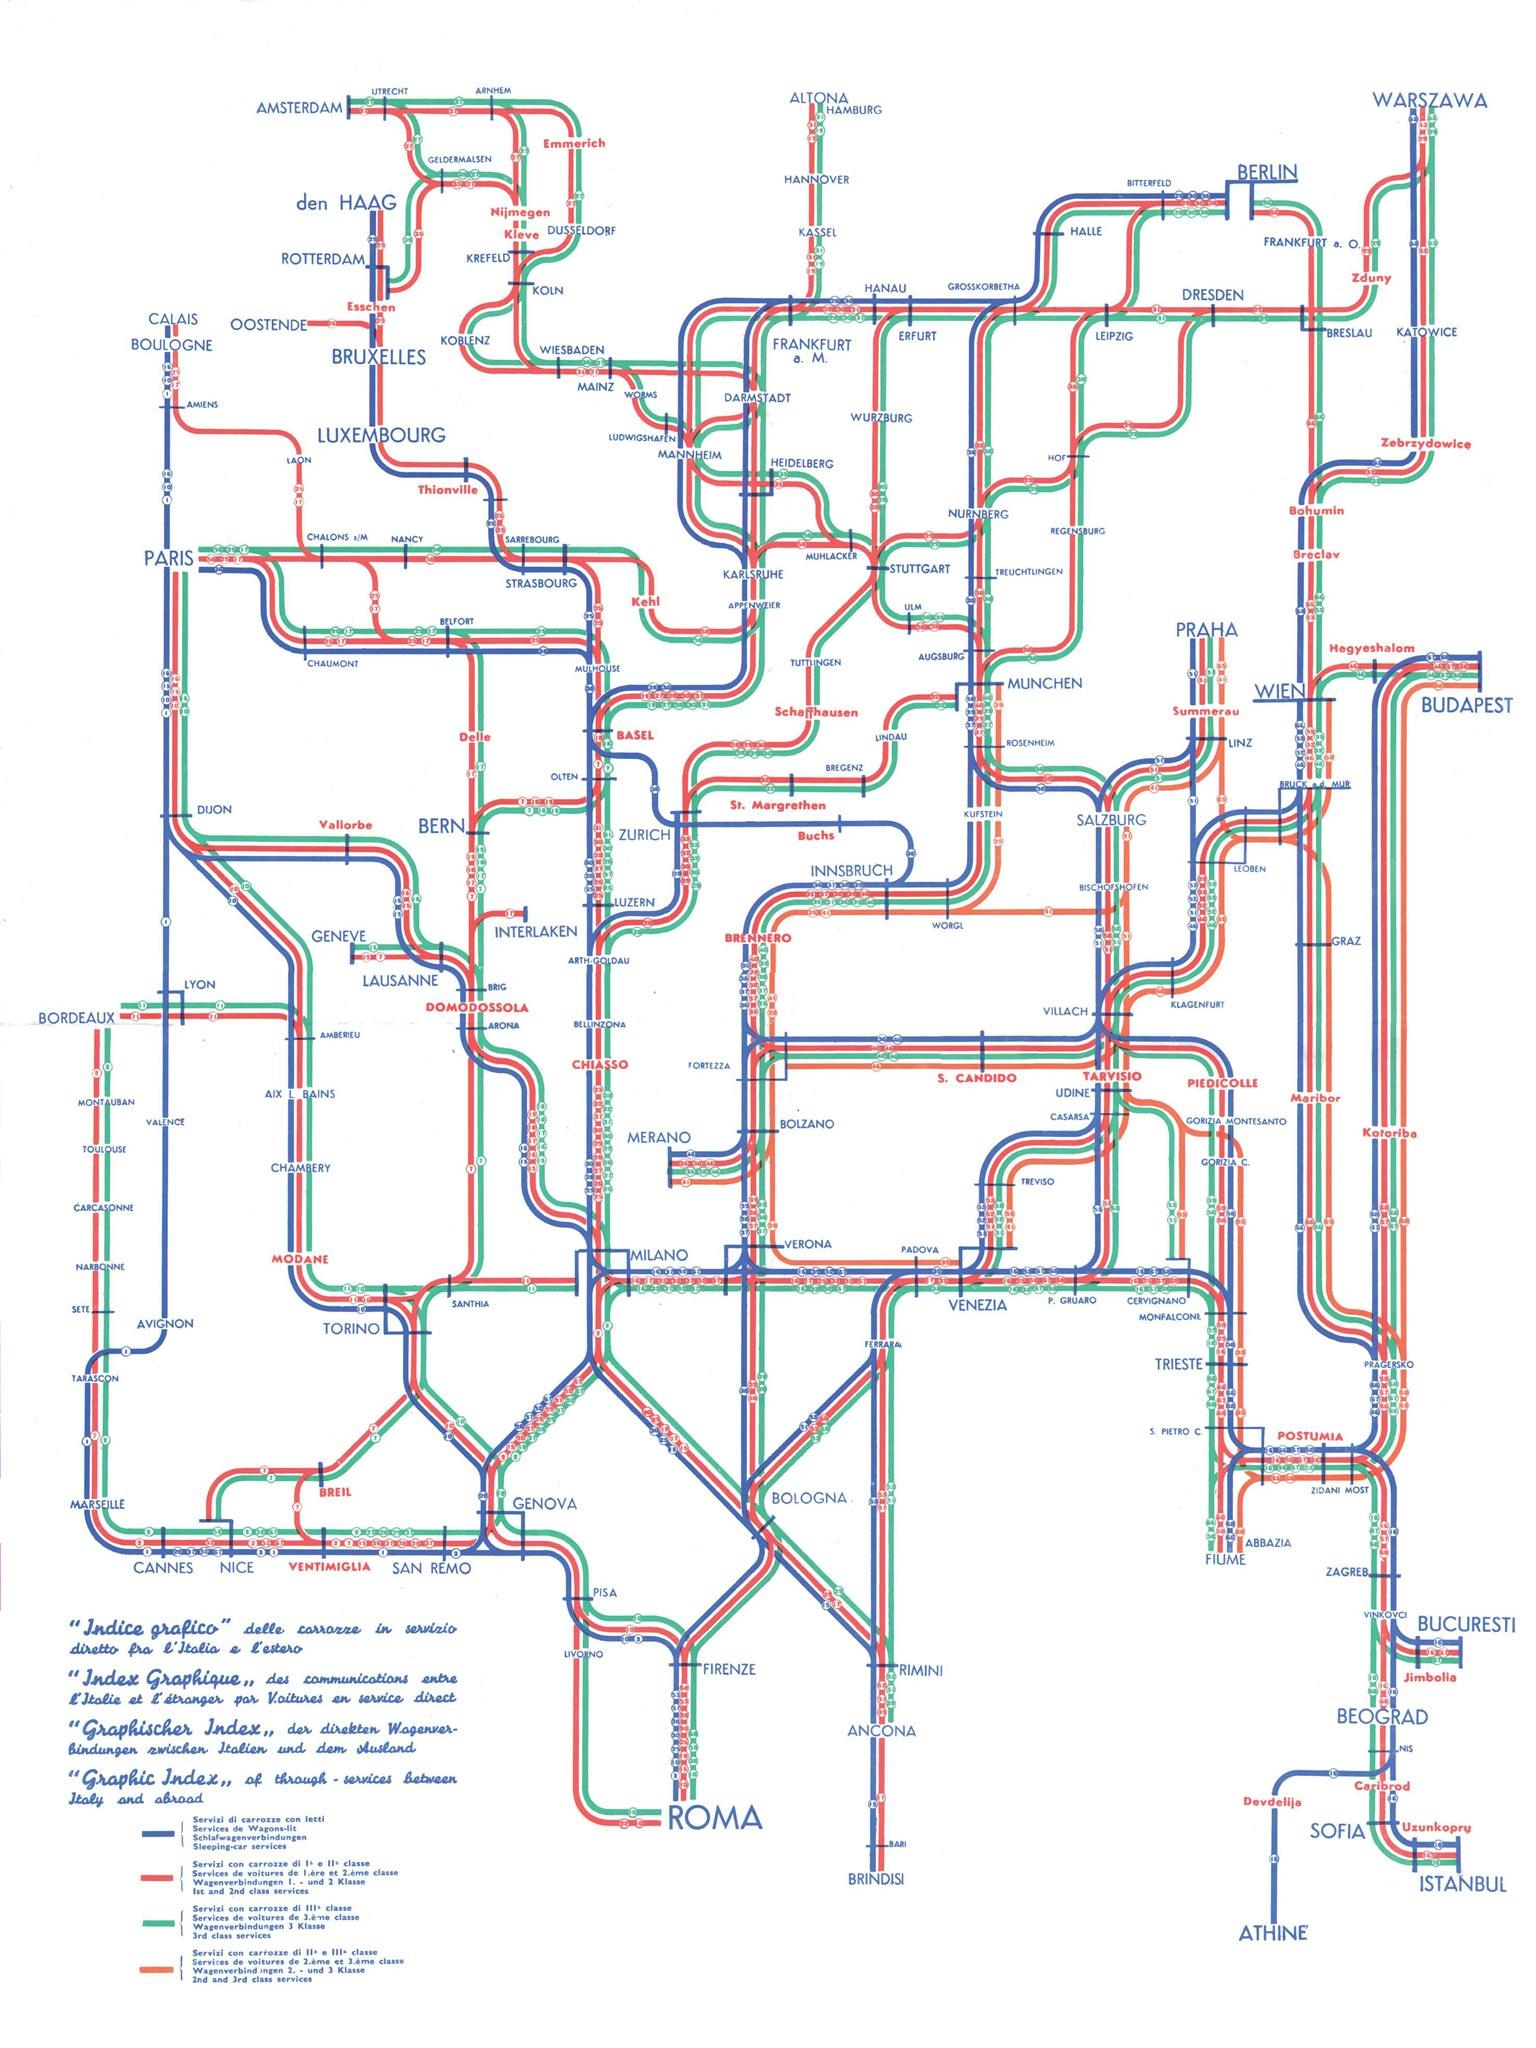 Along straight lines schematic railway maps retours